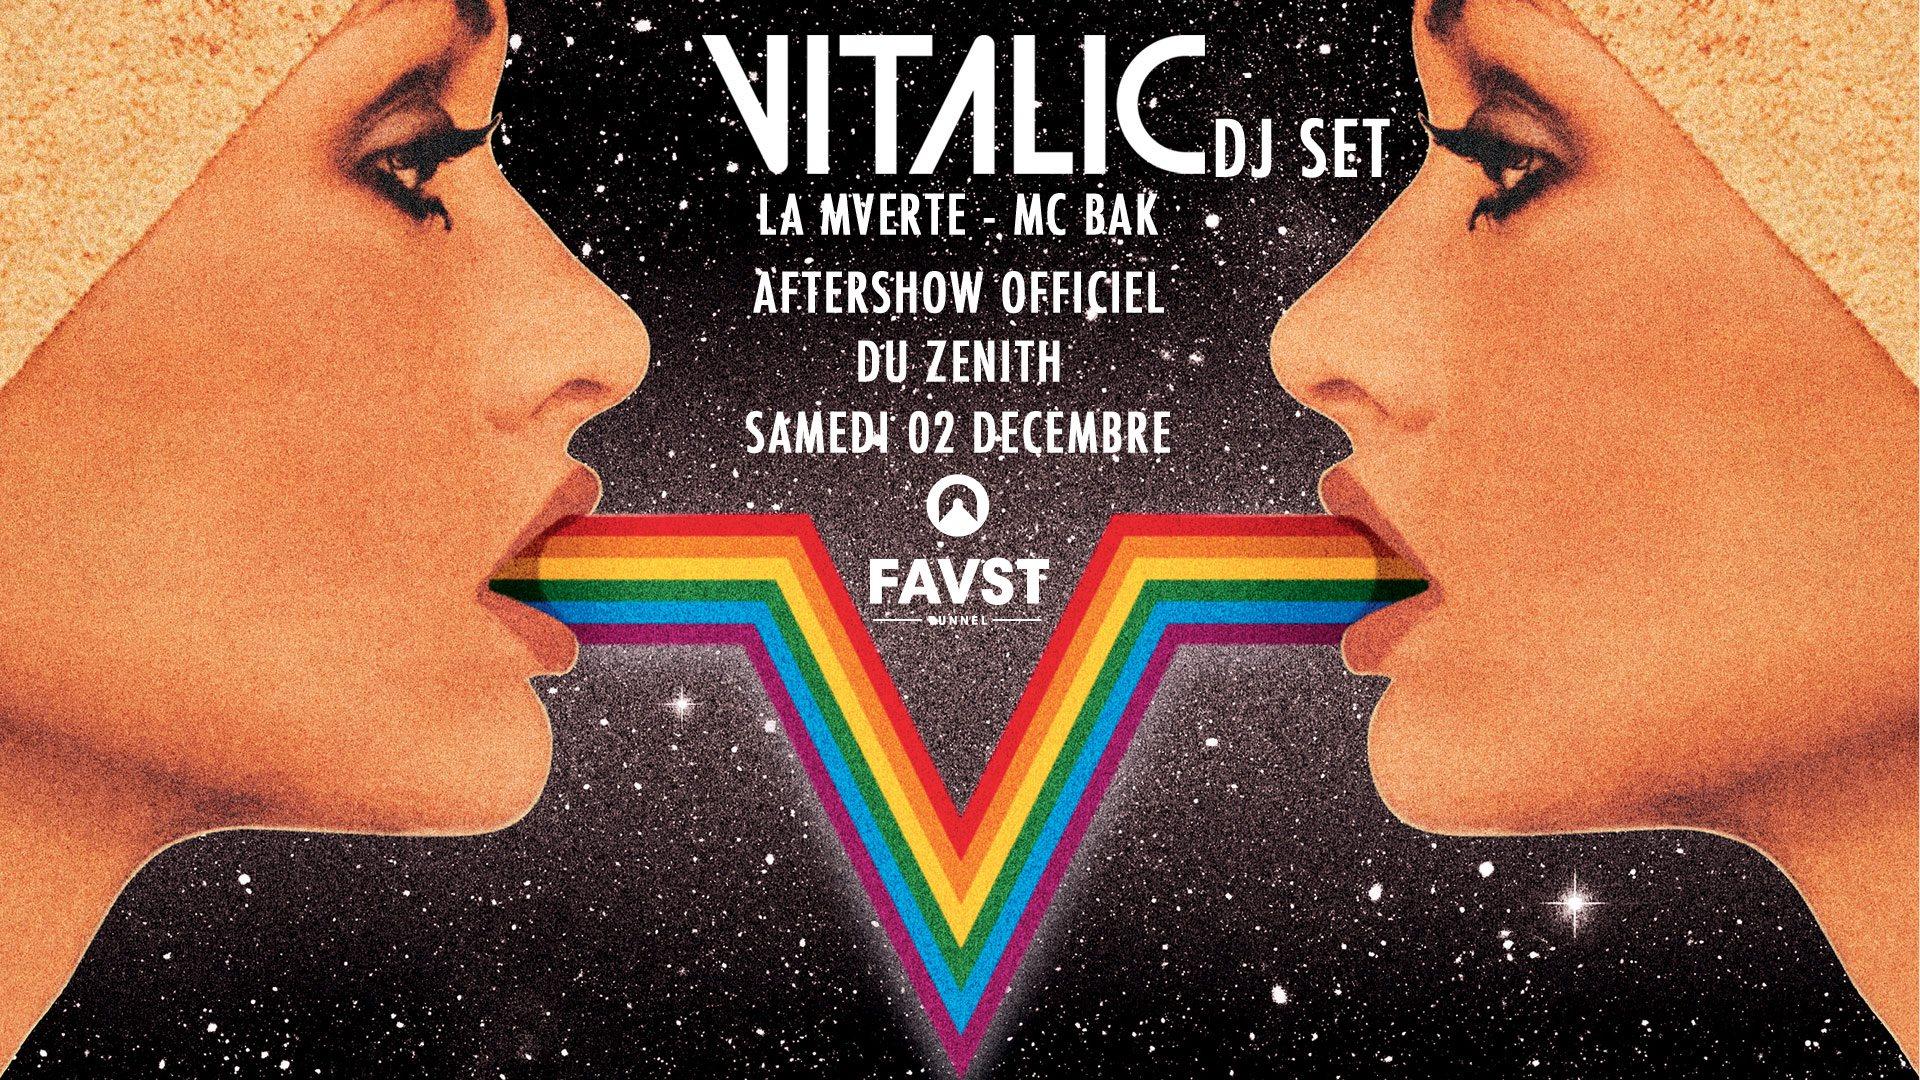 Faust : VITALIC (DJ SET) - Zenith Aftershow